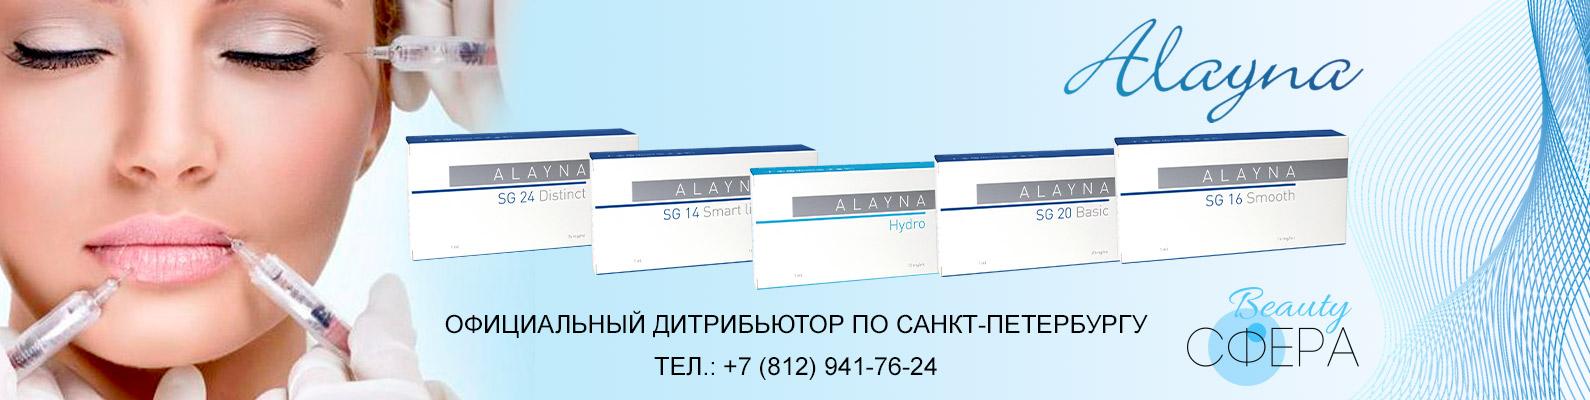 alanya-01-812-1590x400